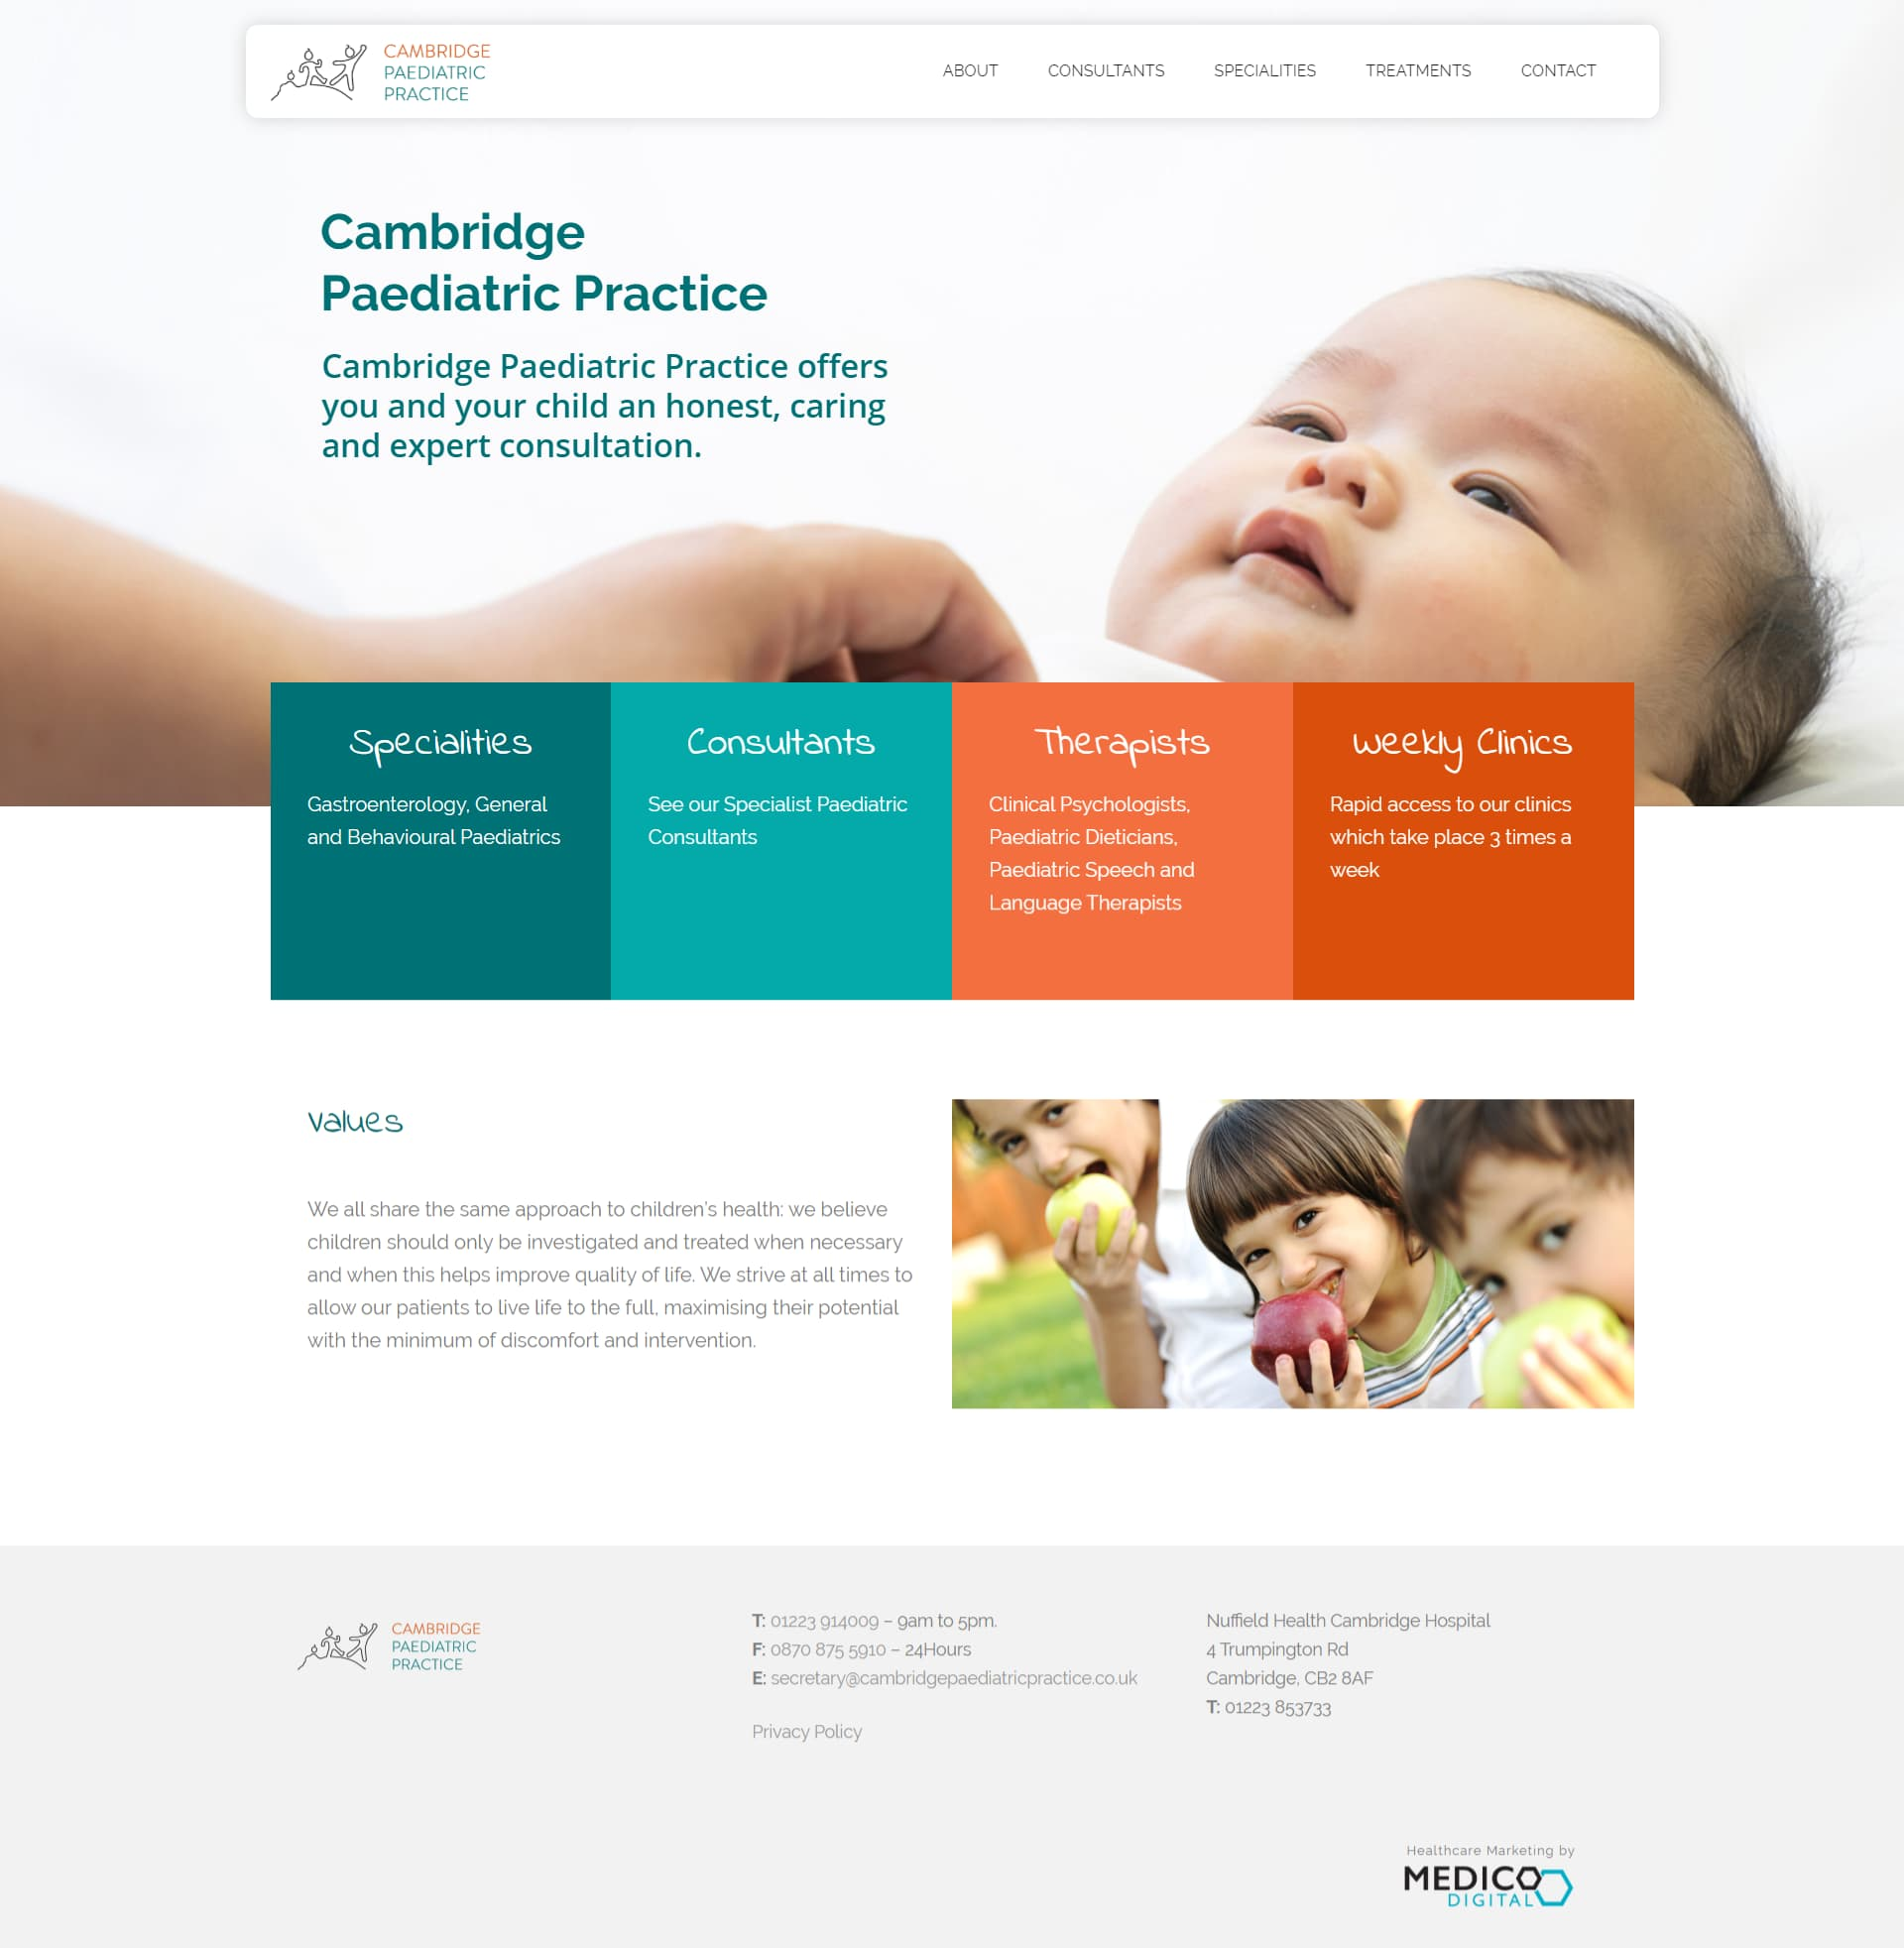 cambridge-paediatric-screenshot-1-1